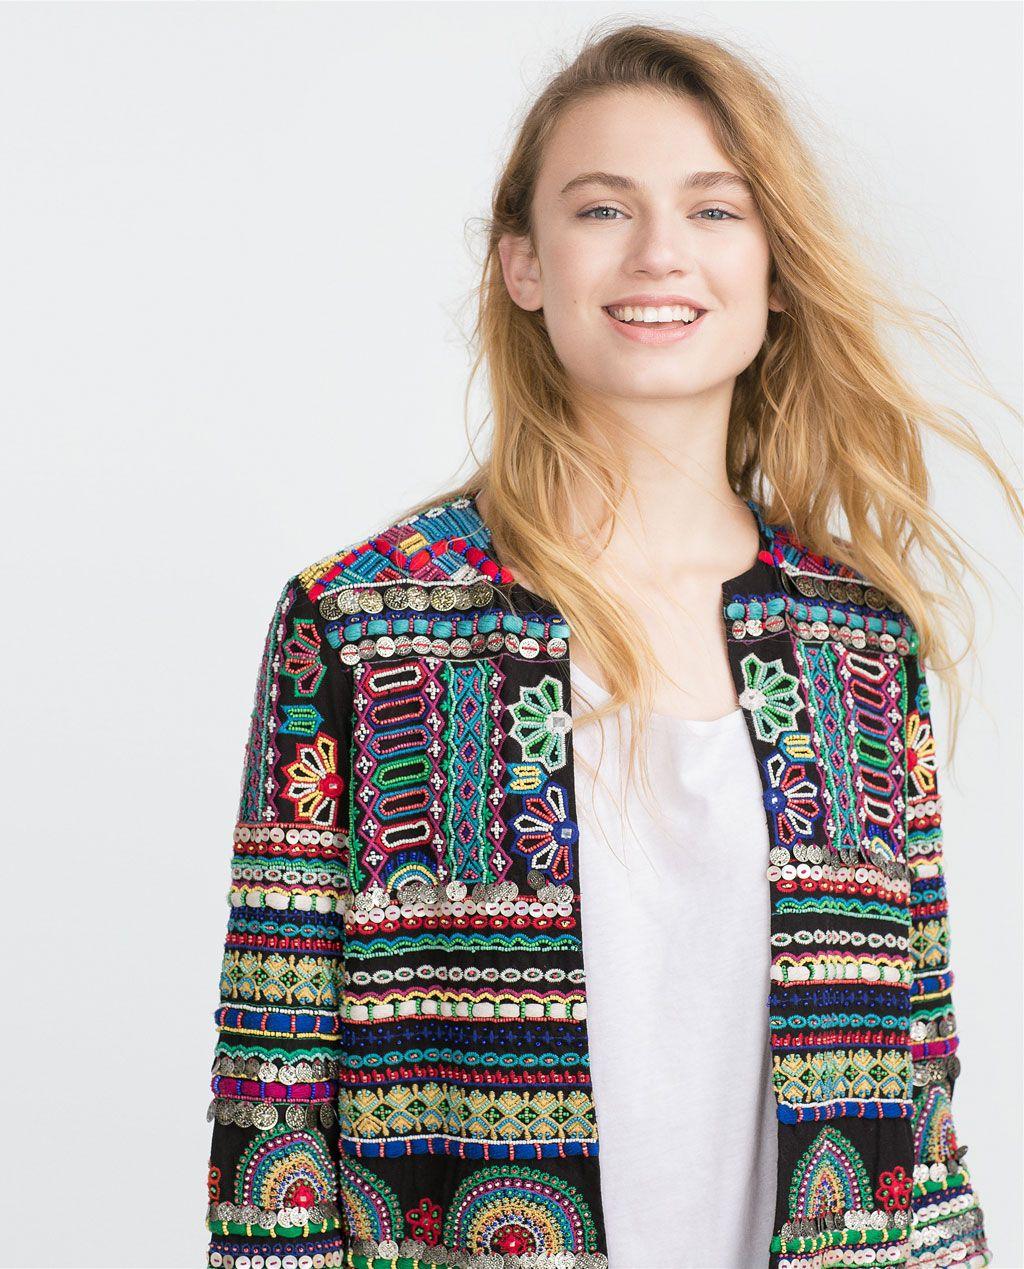 Chichwish flower embroidered boho dress, studs, mango studded jacket,  embroidered dress, topshop